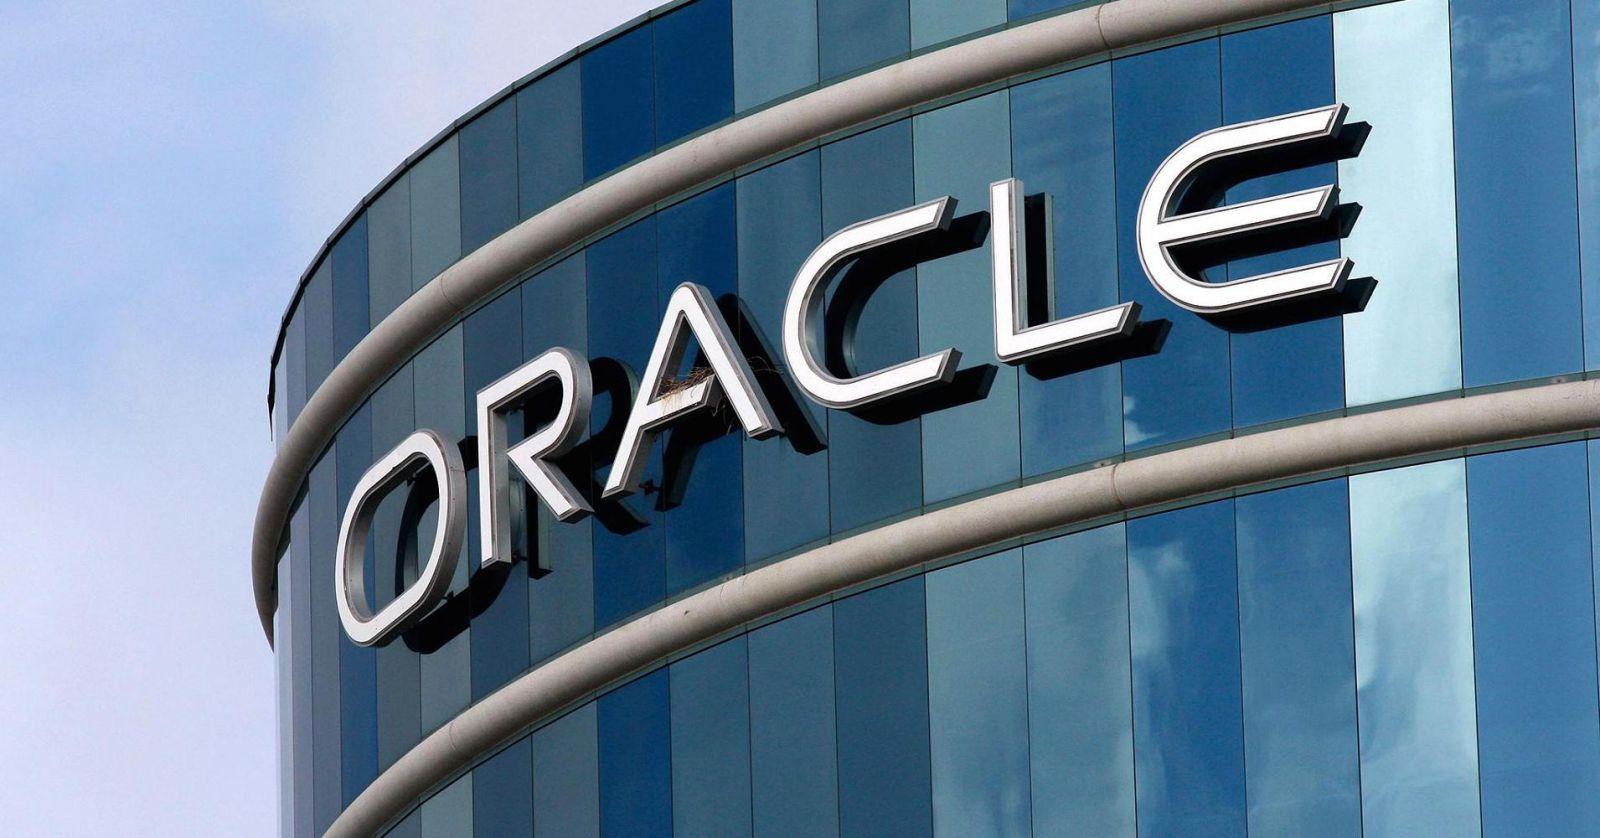 Oracle ограничила сотрудничество сроссийскими нефтяниками, пишут СМИ